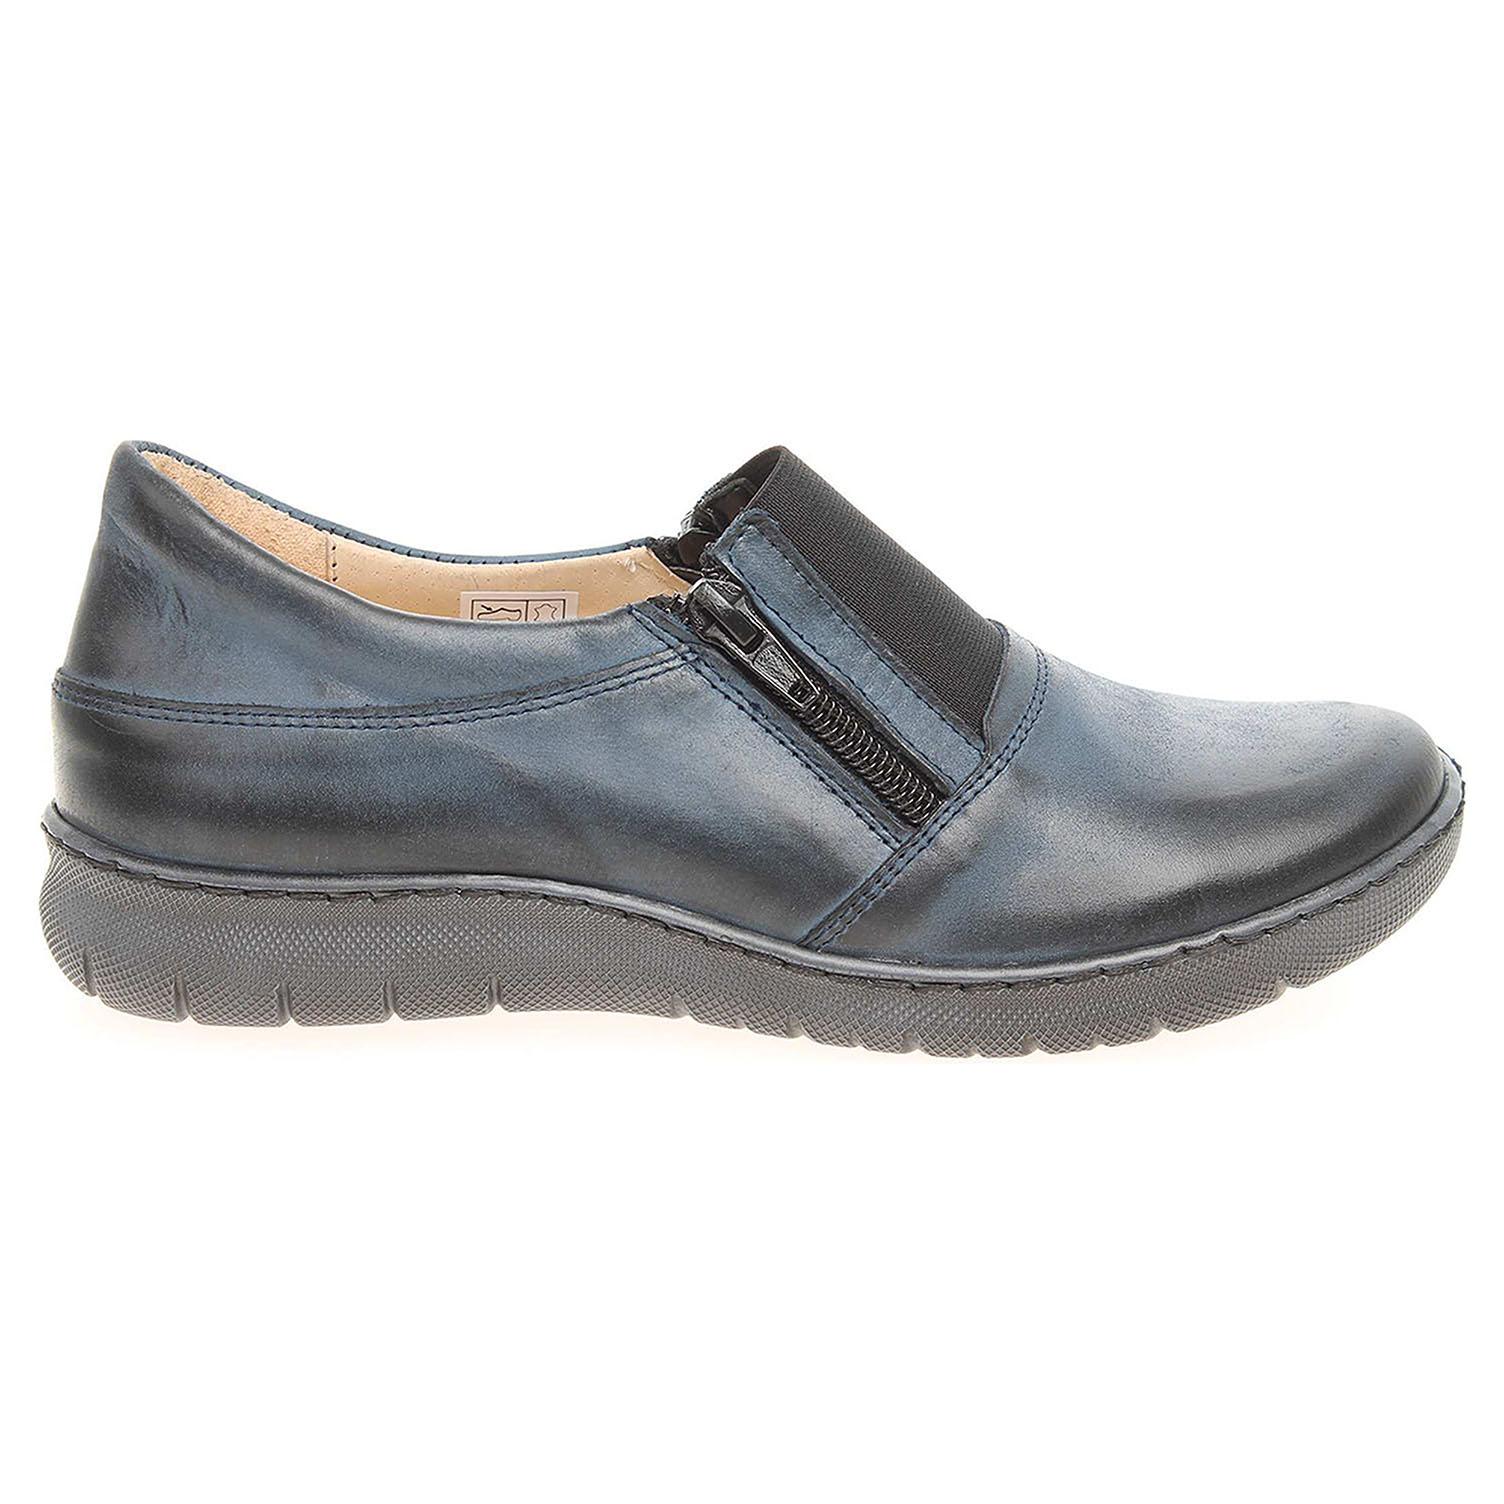 Ecco Dámská obuv PIN59 modrá 23200731 14356d0bdaf